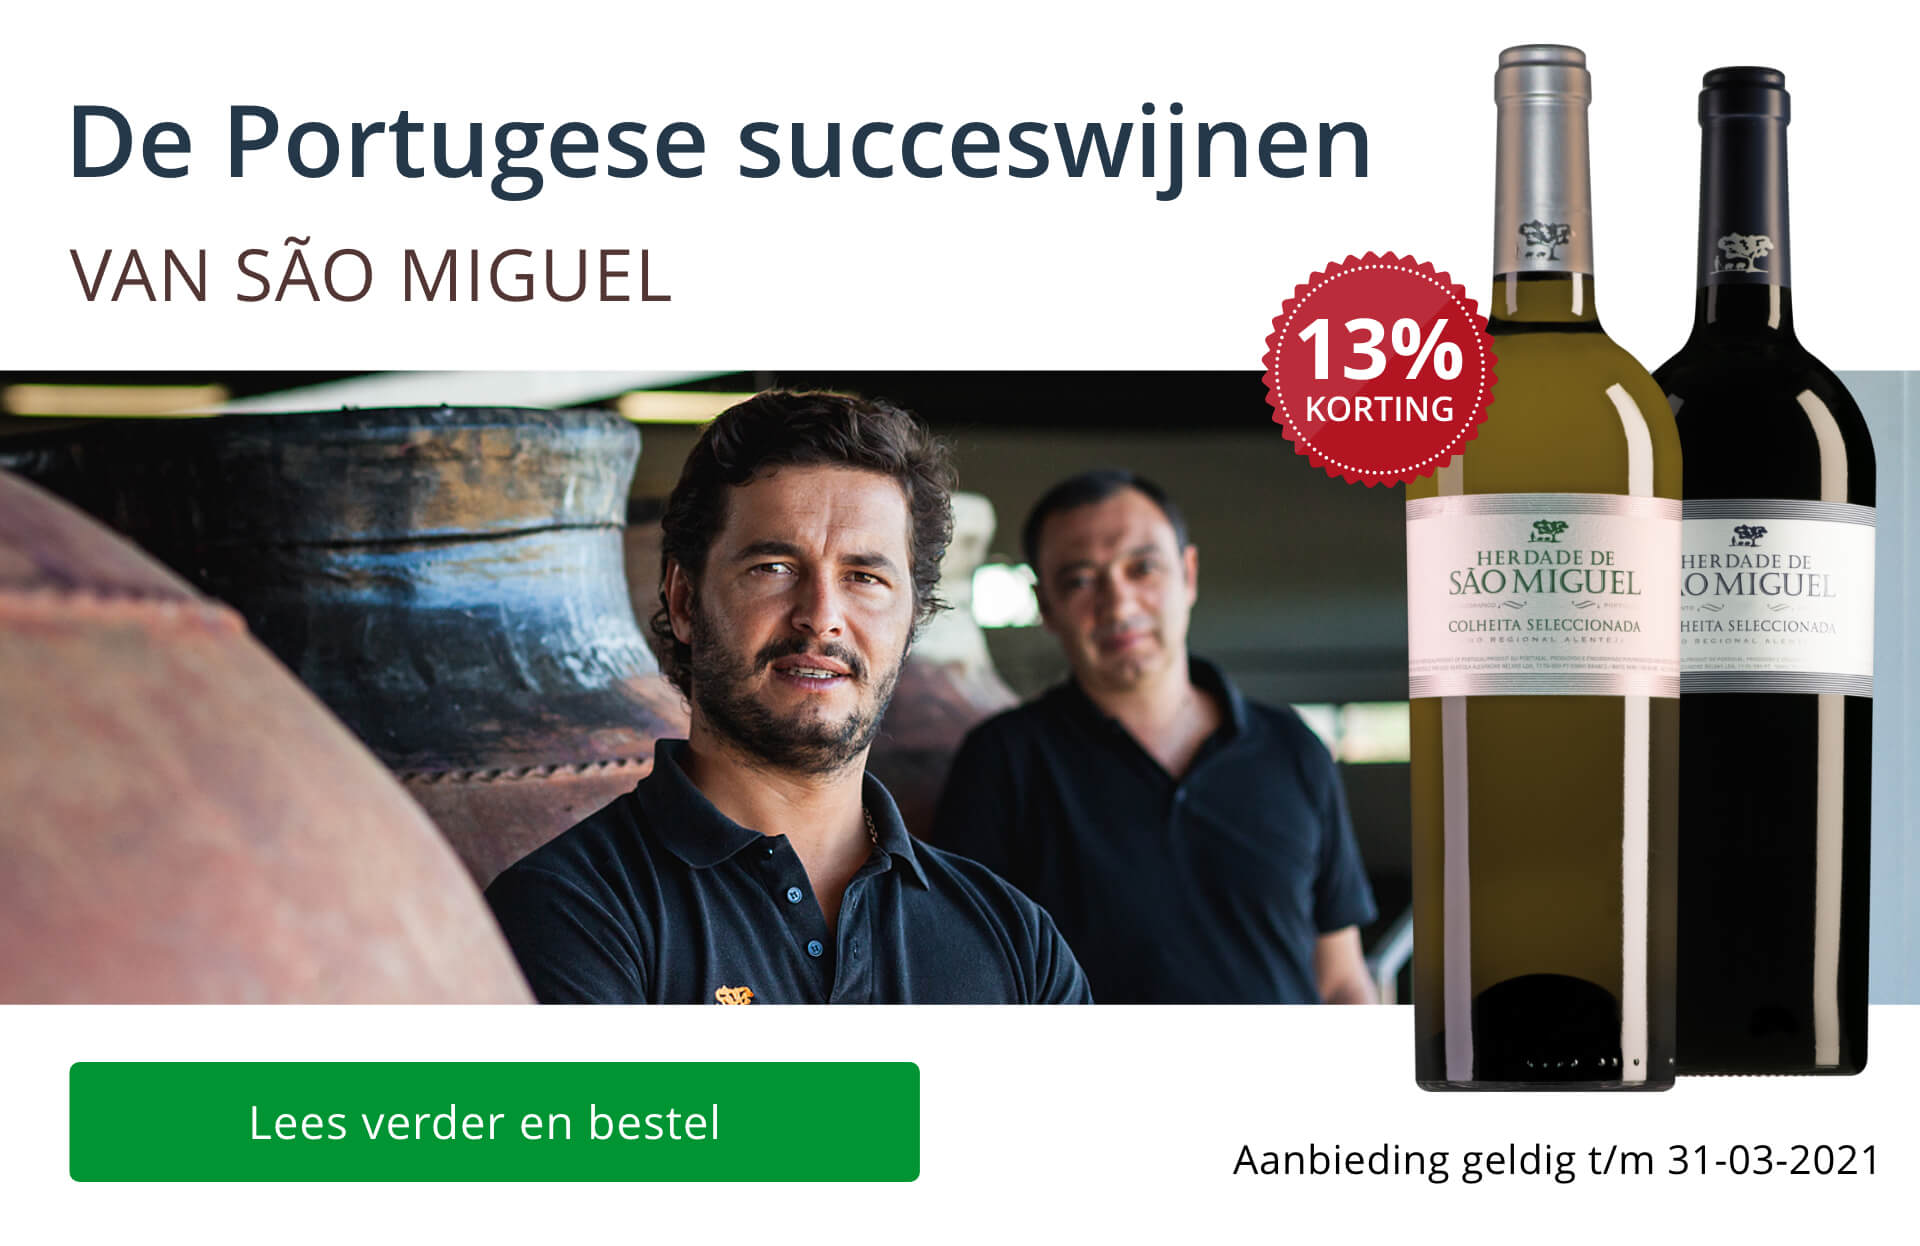 De Portugese succeswijnen van São Miguel